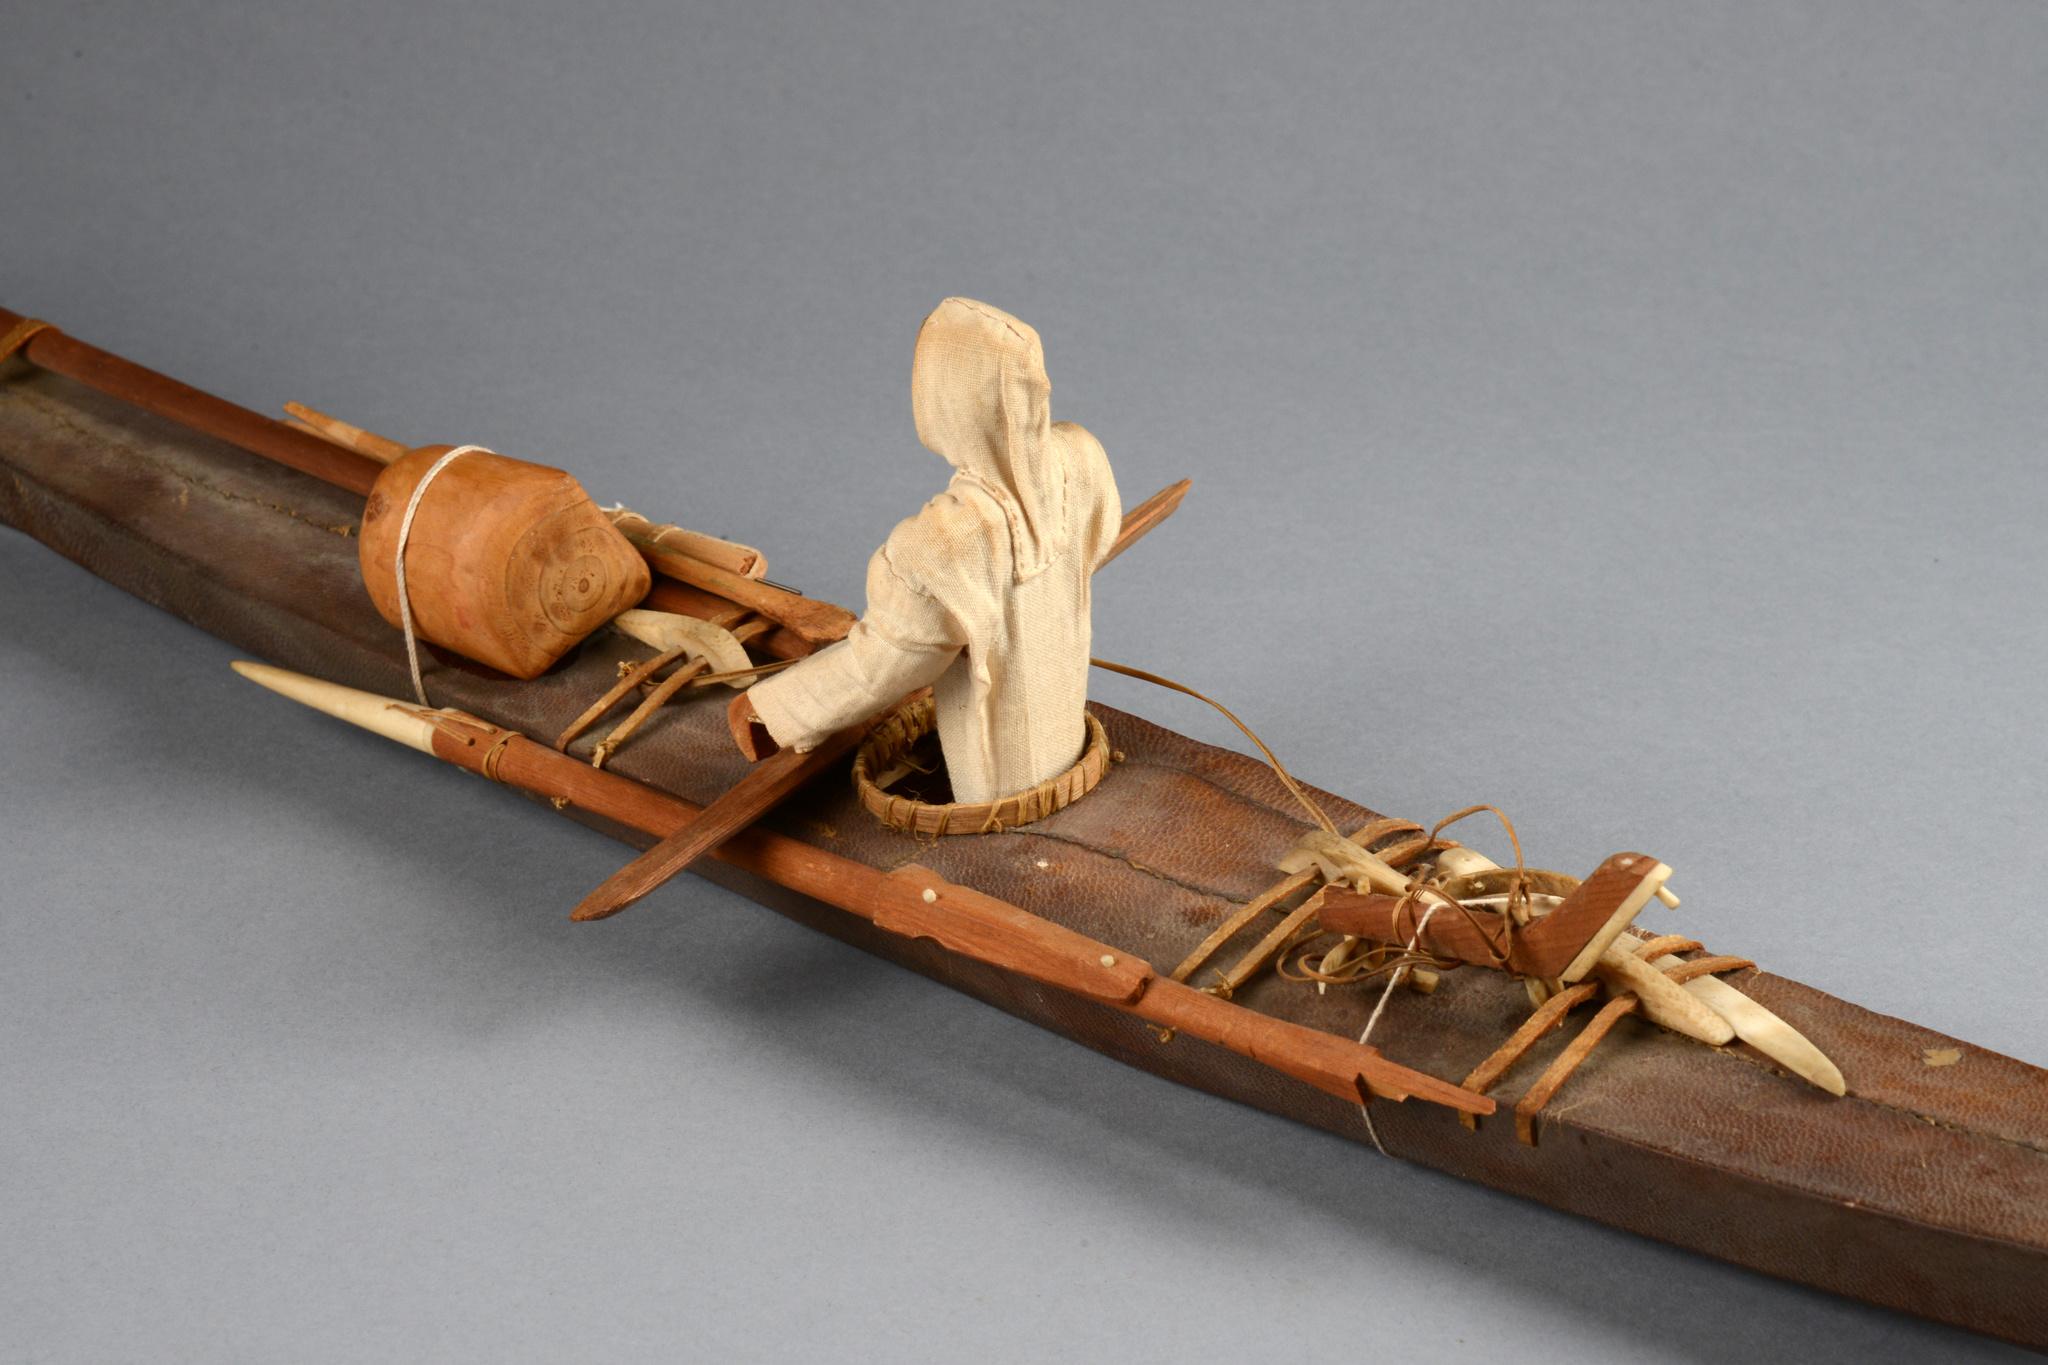 Model of Inuit cajak